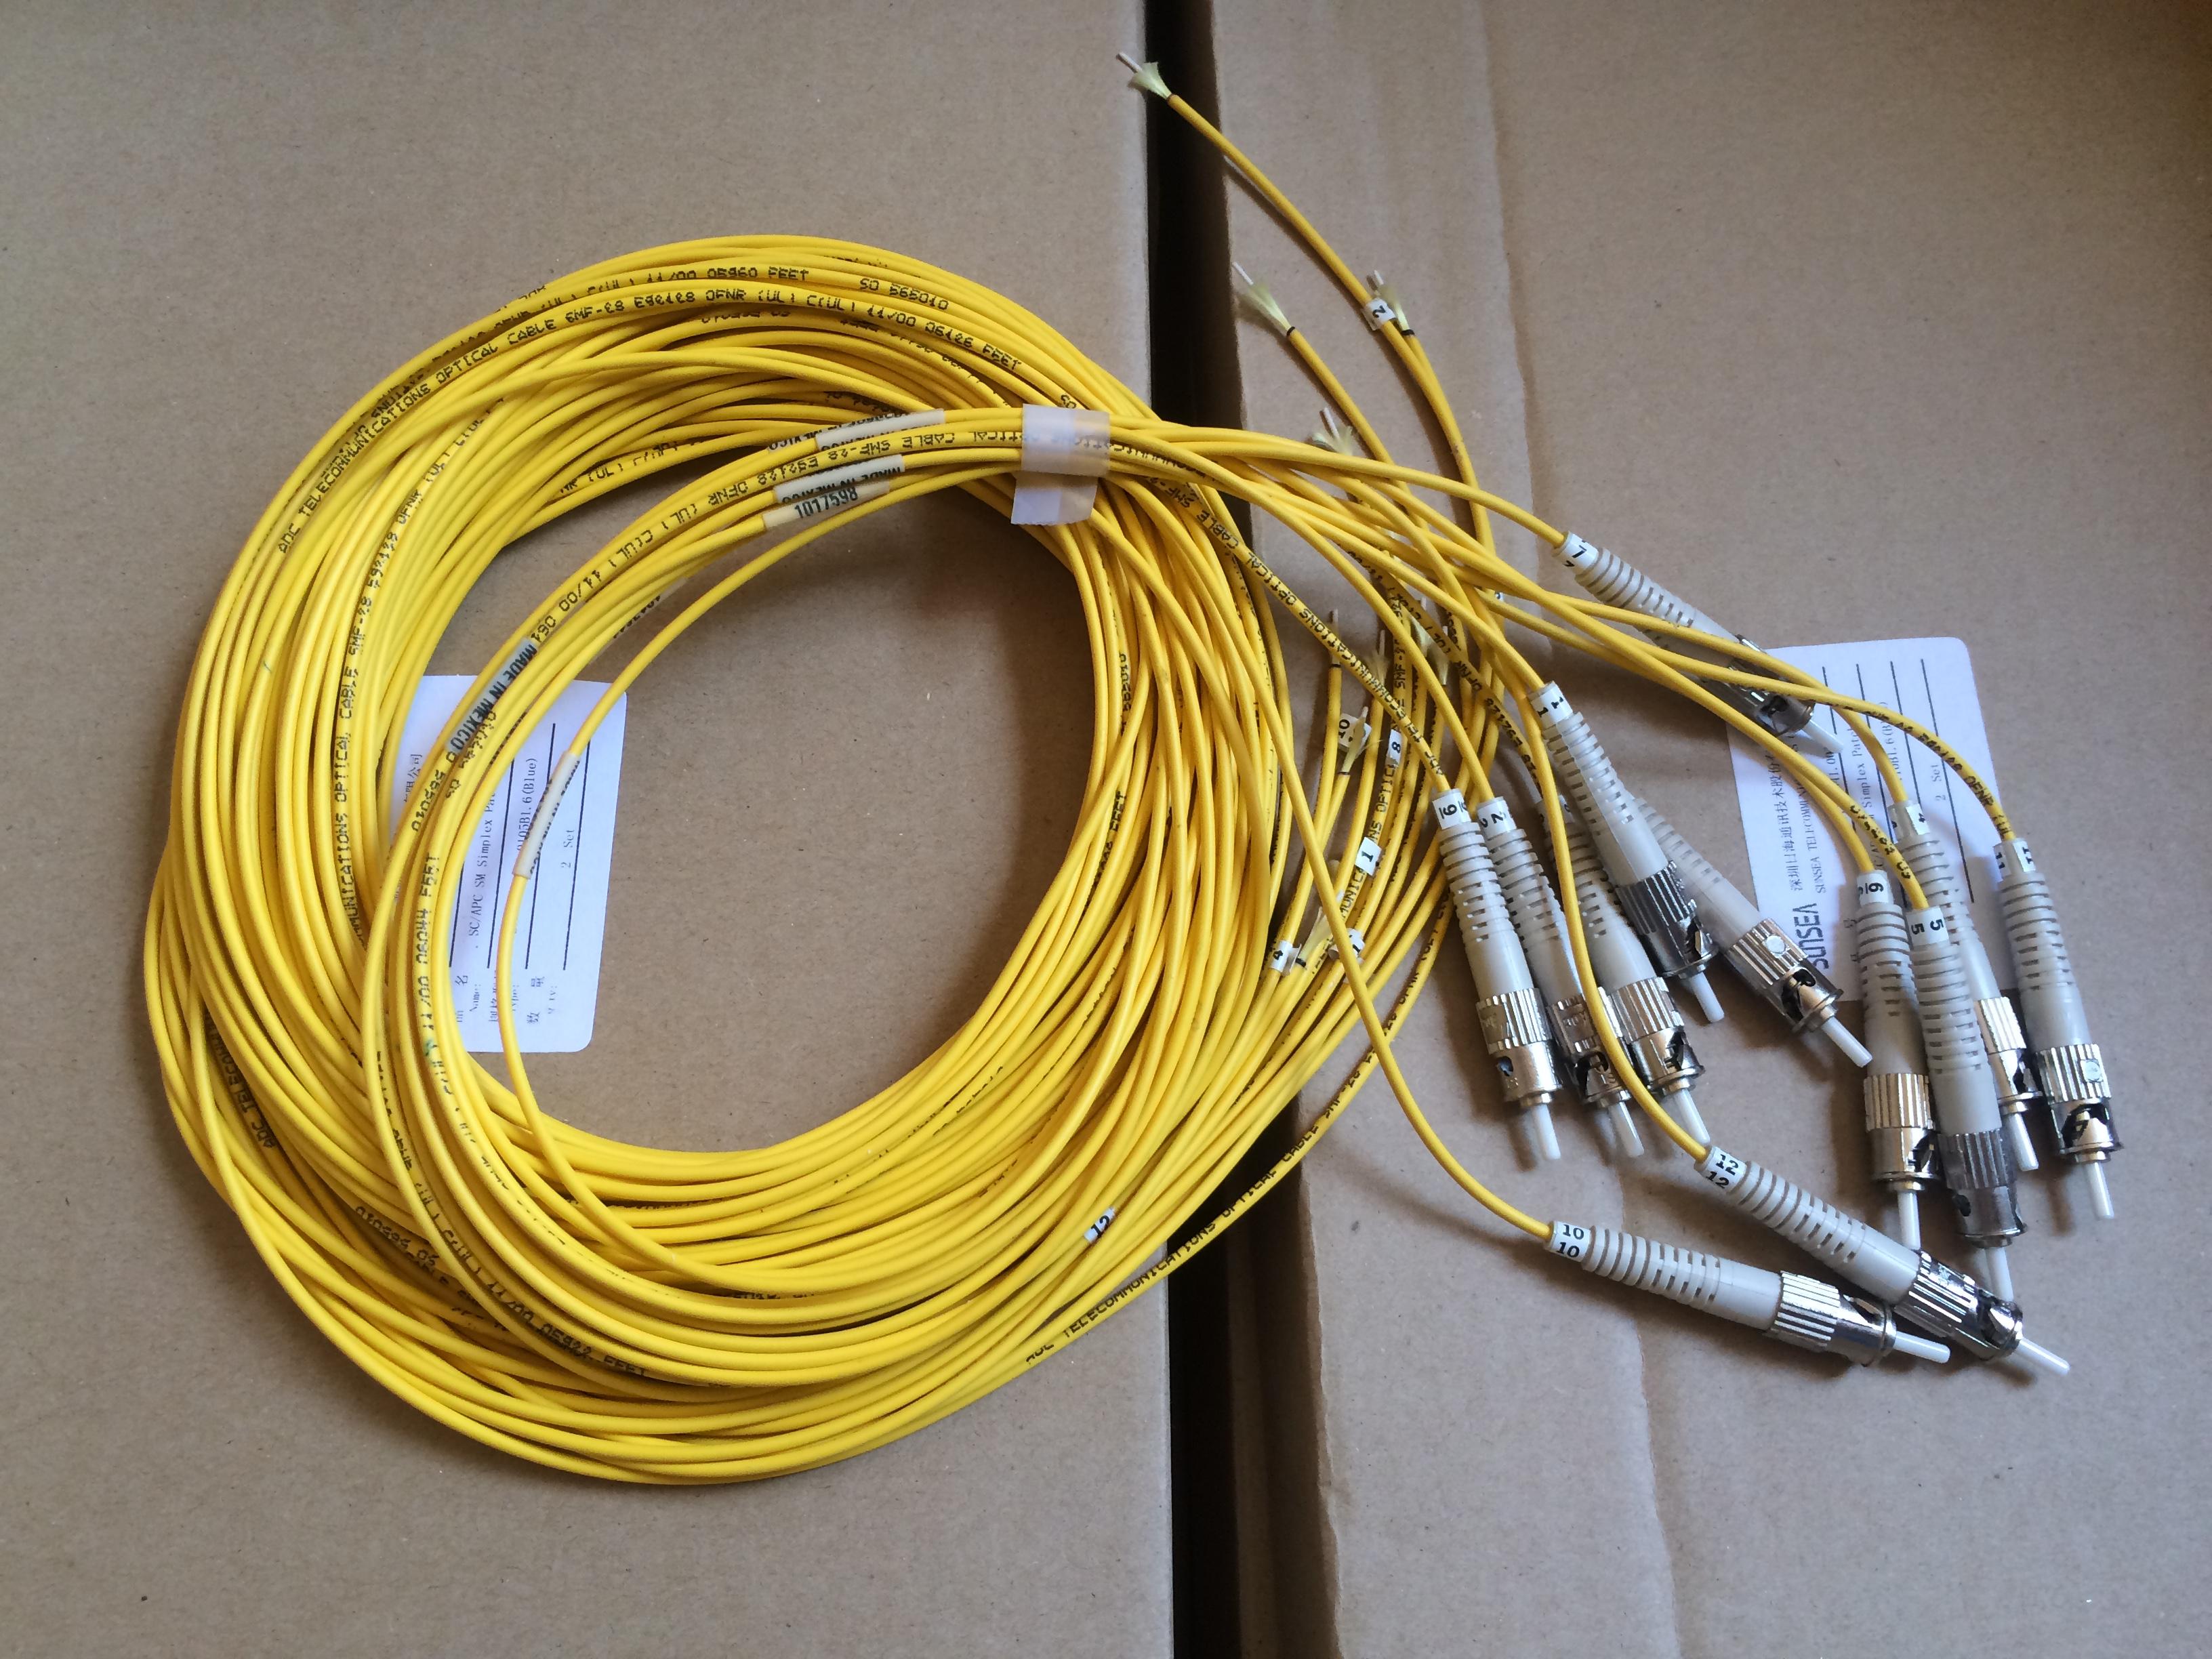 1U 19″ BRUSH PANEL SHELF BLACK, Cable Management Panel Front Patch Cord Access